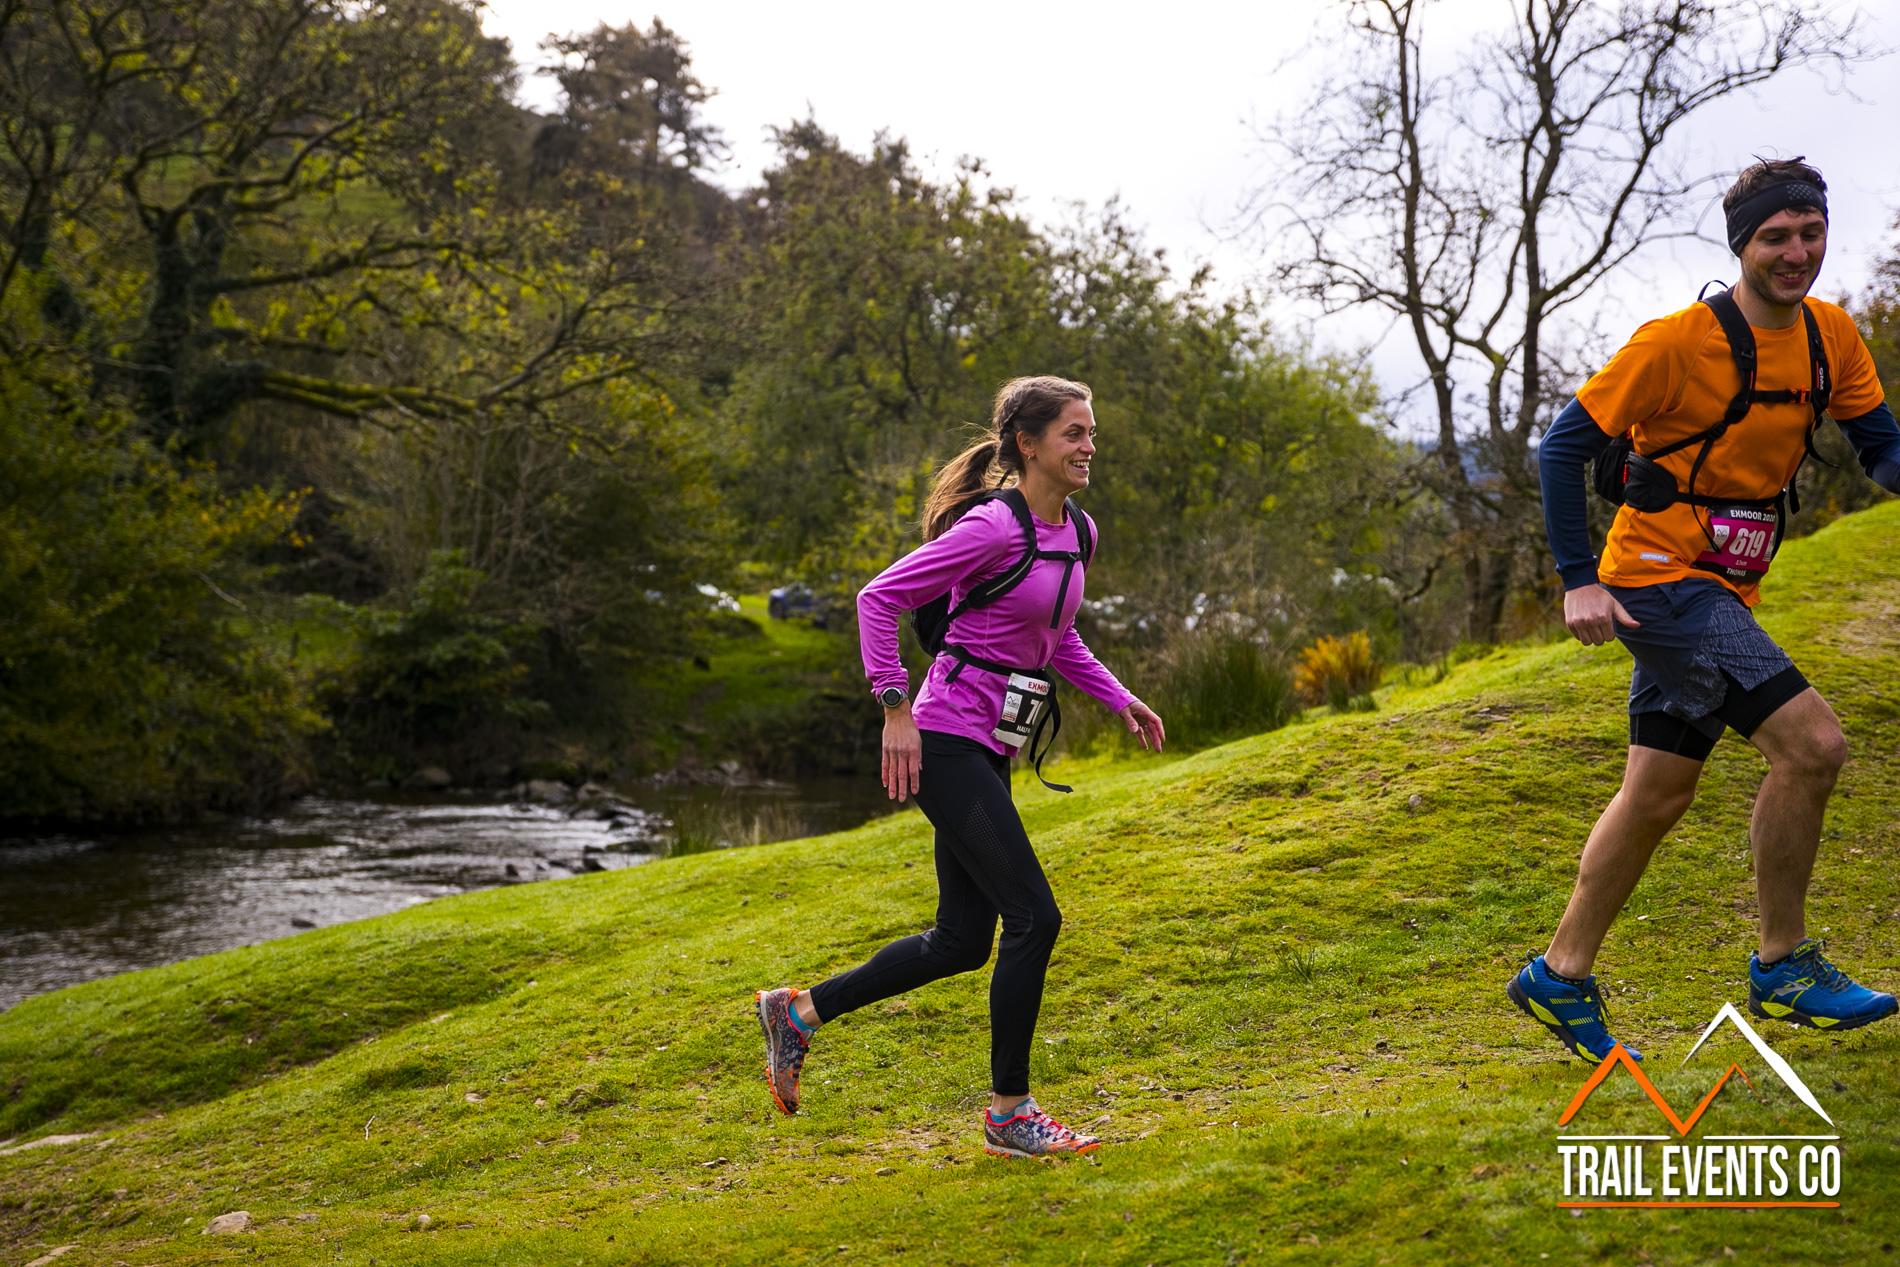 The Glyndwr 100 Mile Challenge & Relay/ Ras a Rali Glyndwr - Trail Events Co